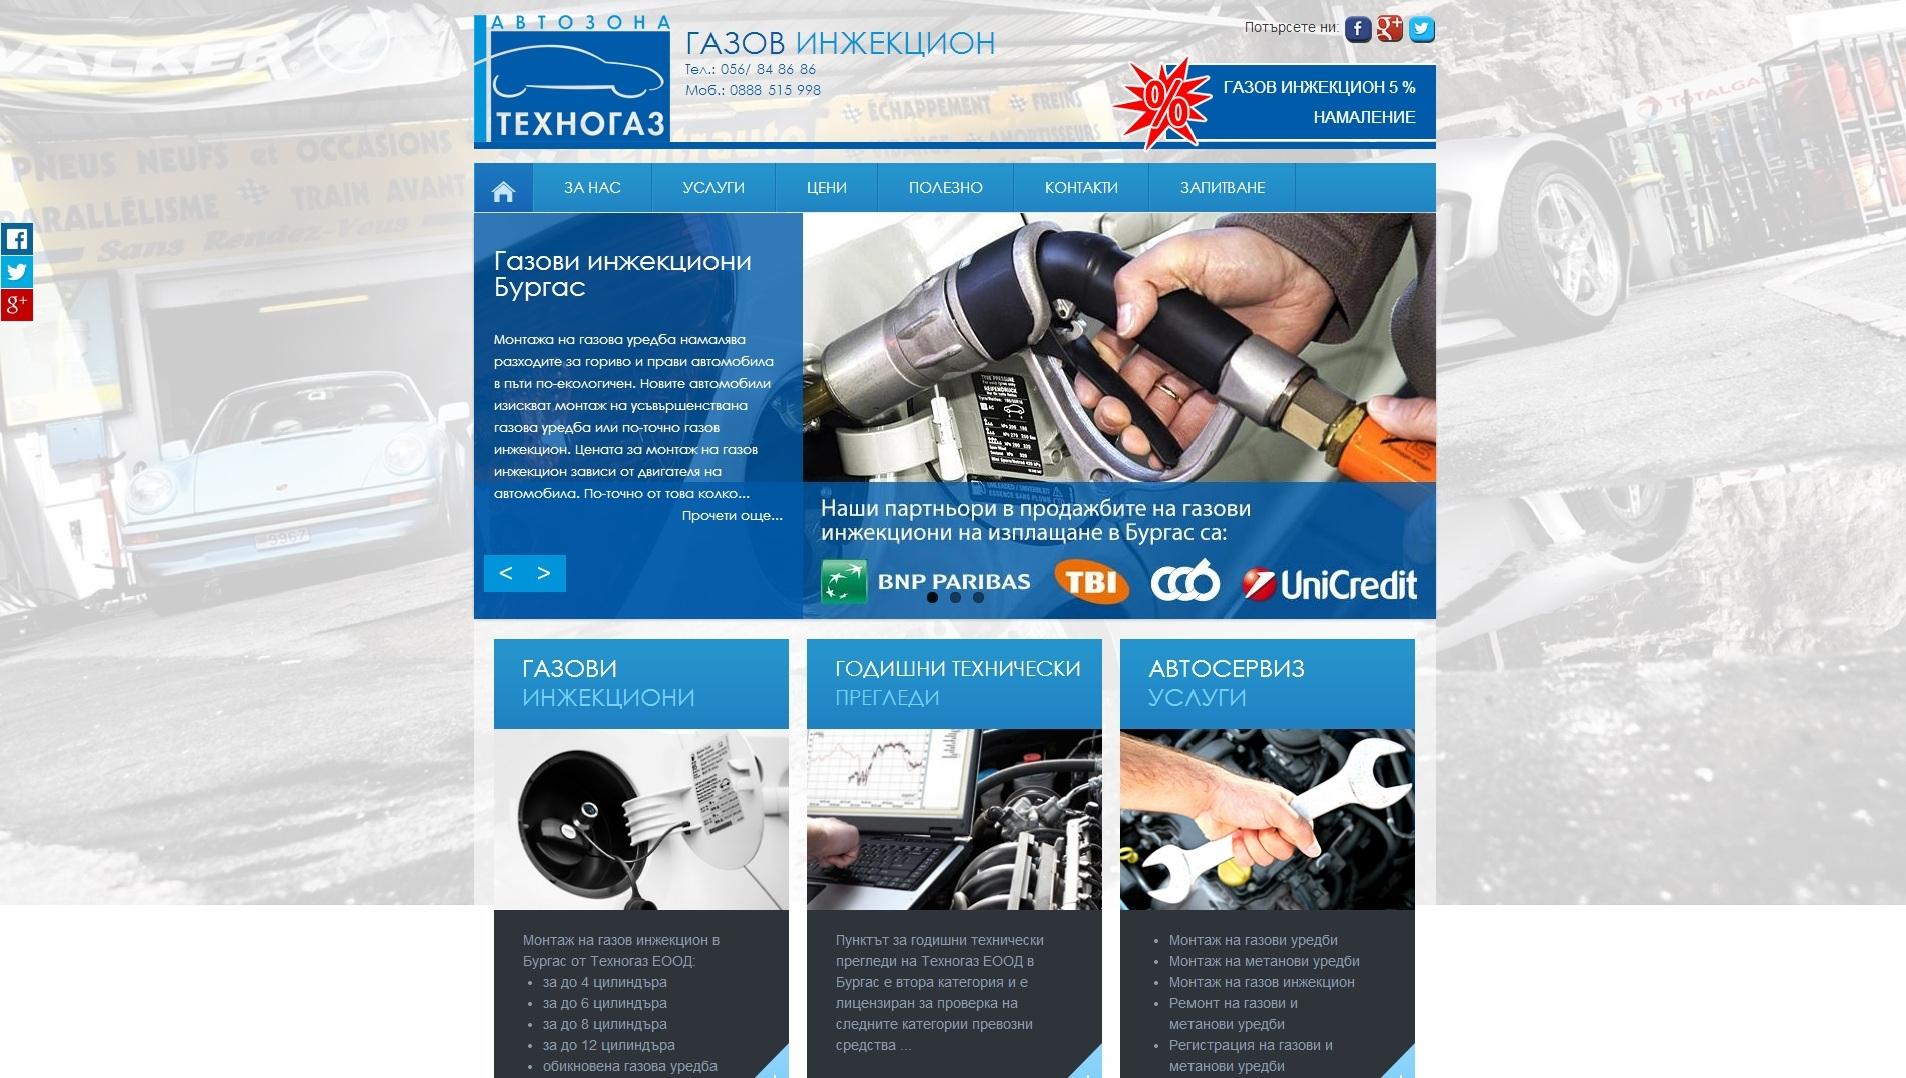 Сервиз за газови инжекциони и годишни технически прегледи